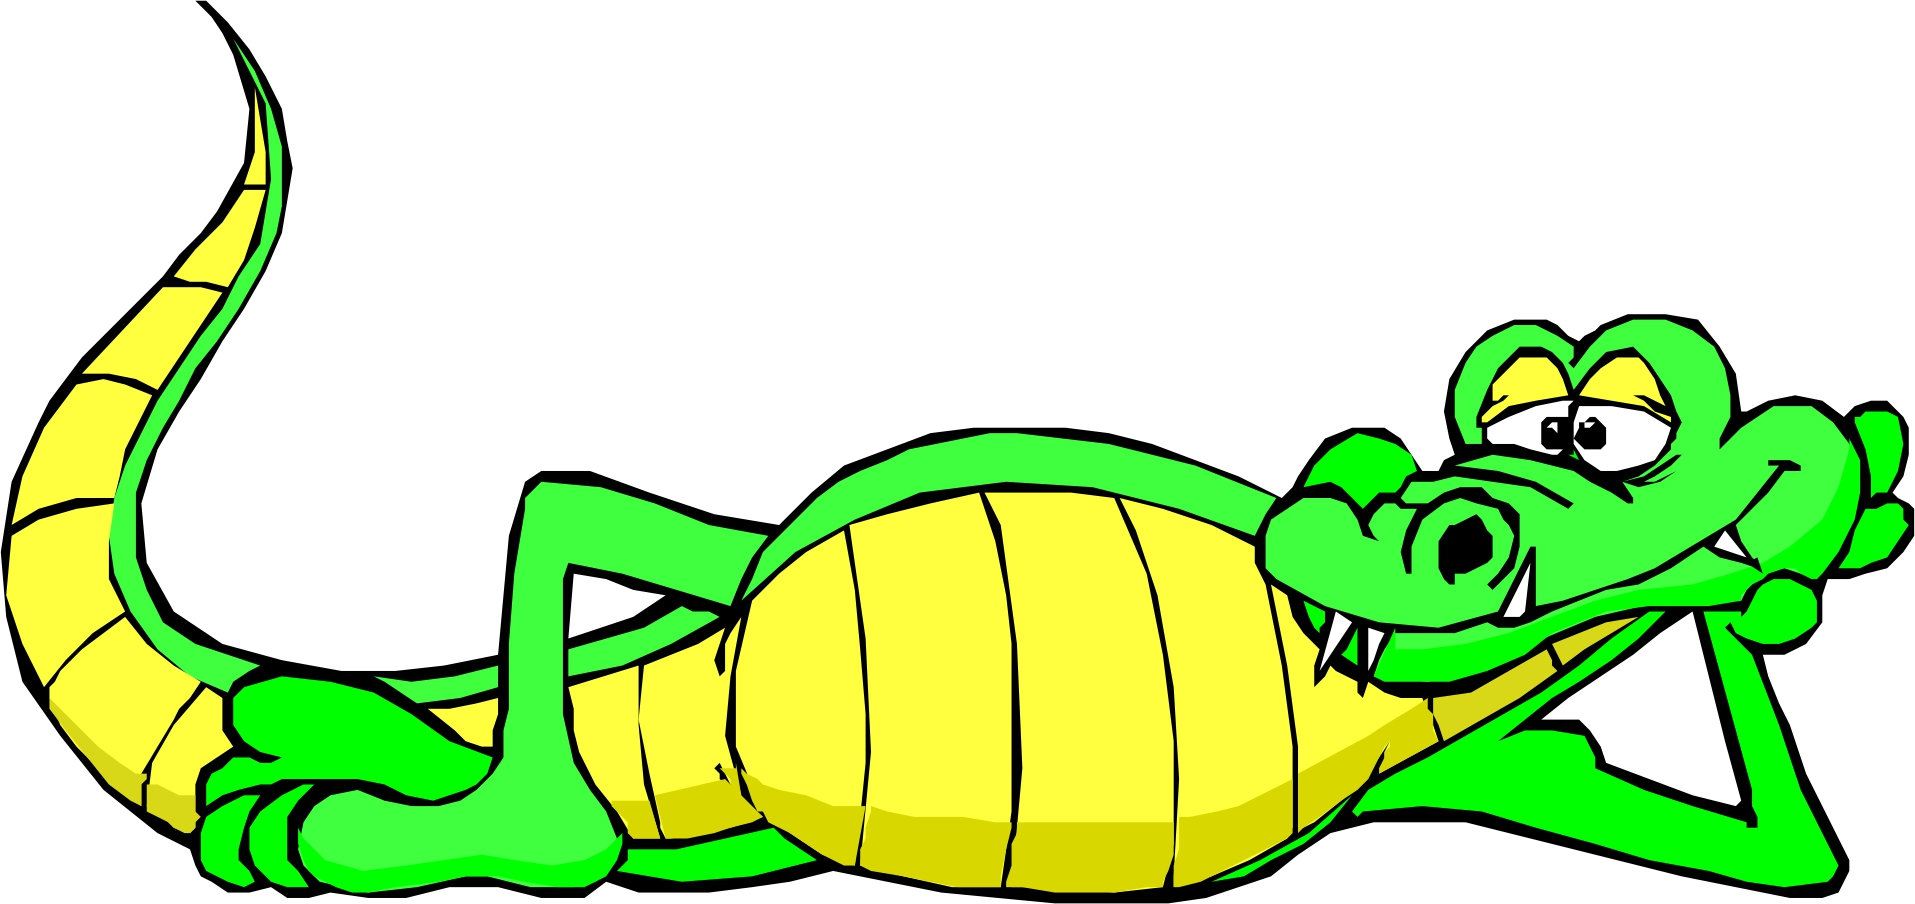 1915x904 Free Clip Art Alligator Clipart Image 8